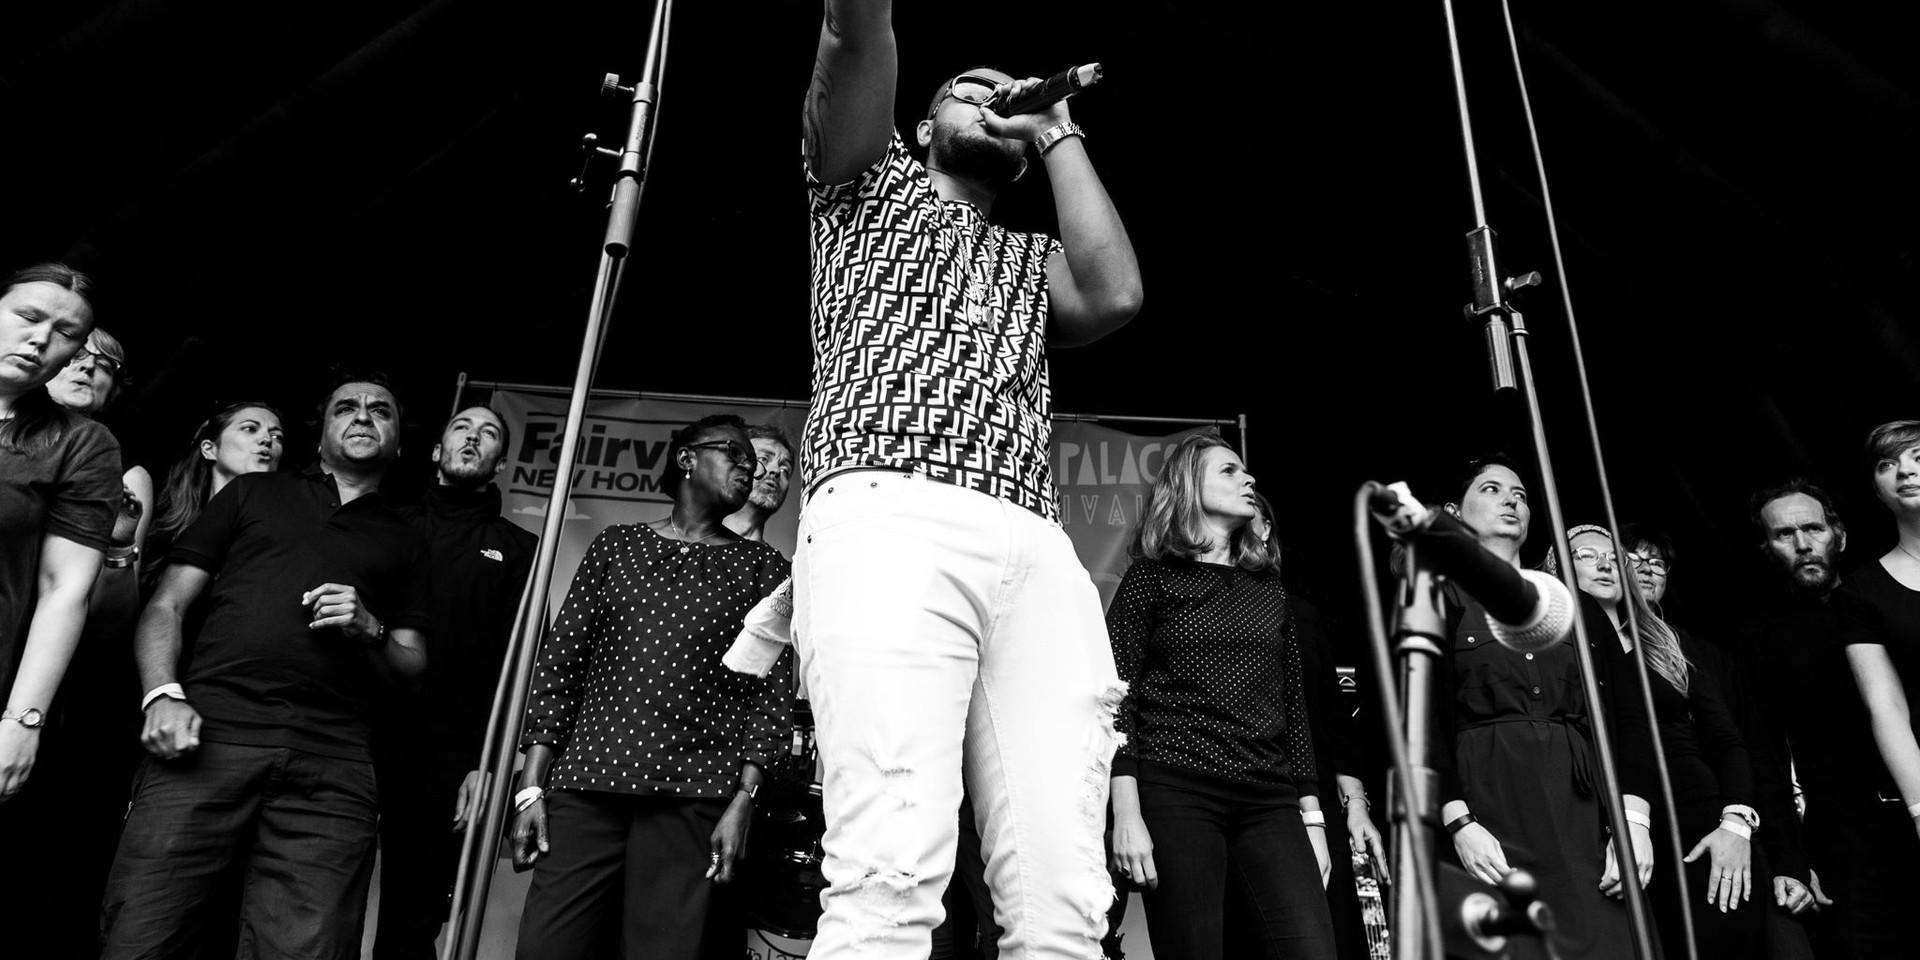 Backing Jay Snaggz at Crystal Palace Festival